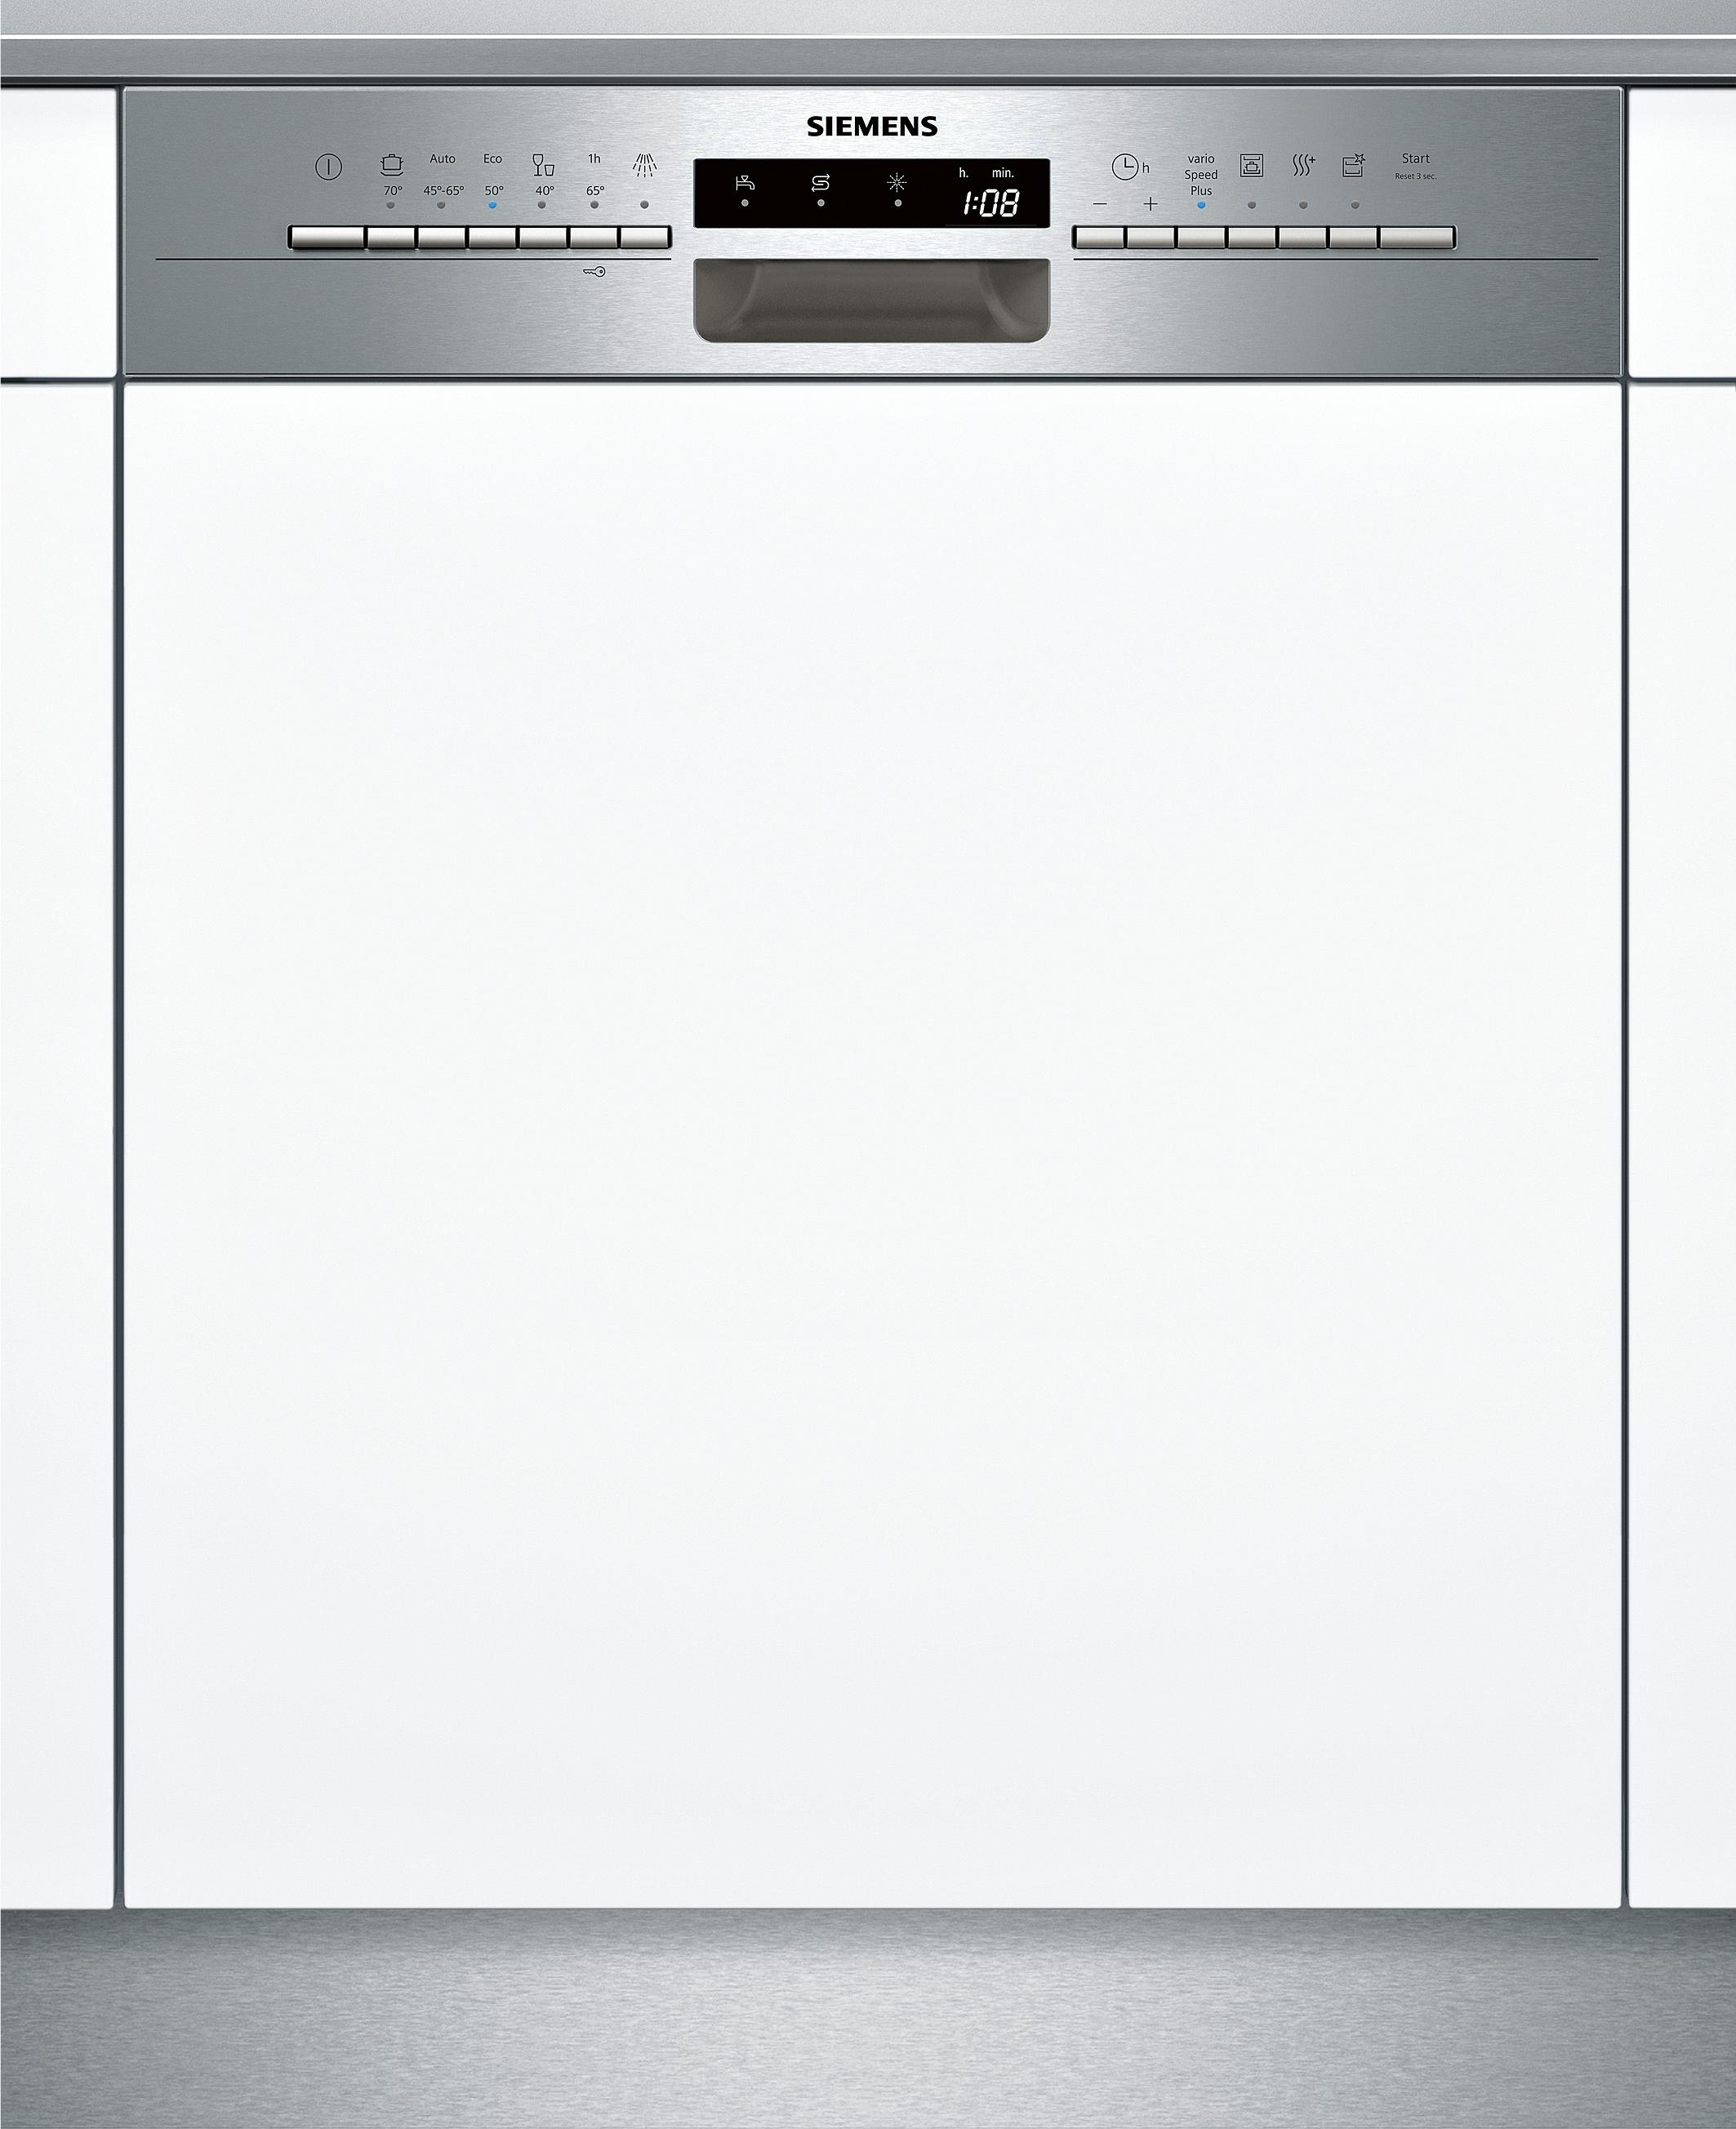 geschirrsp ler sn536s03ie integrierbar edelstahl speedmatic geschirrsp ler 60 cm. Black Bedroom Furniture Sets. Home Design Ideas